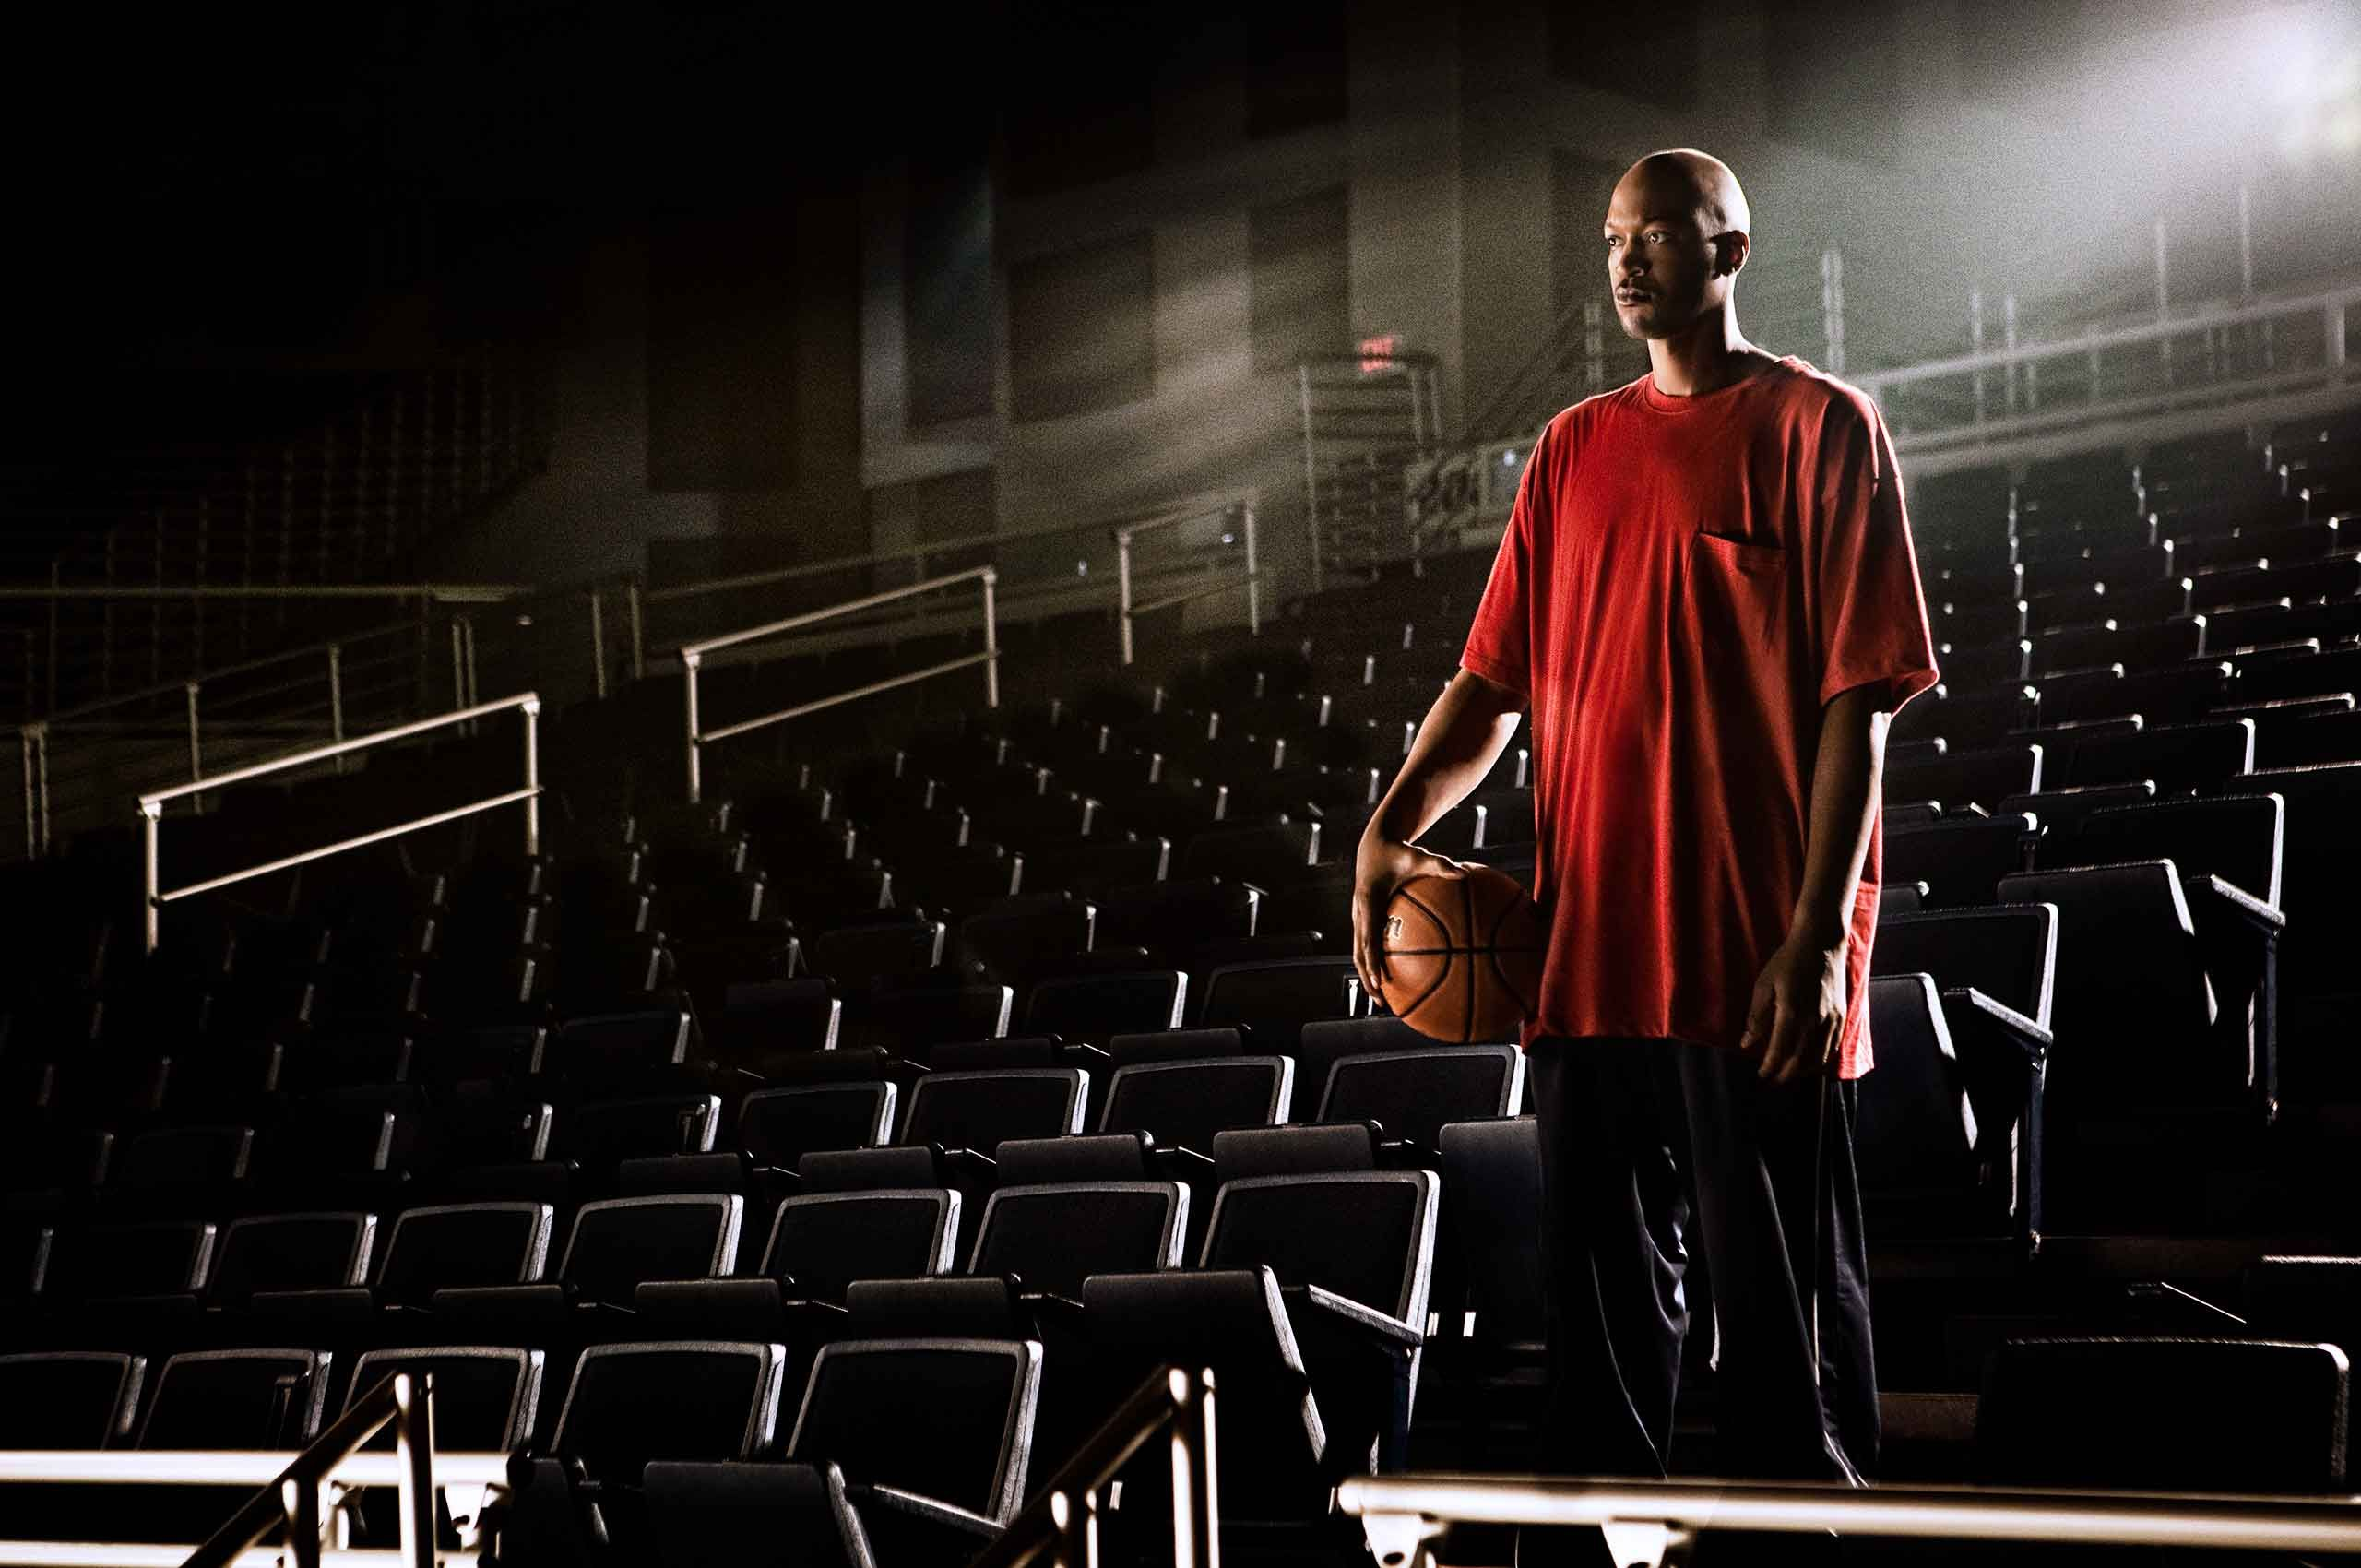 Basketball-HallOfFamer-PennyHardaway-by-HenrikOlundPhotography.jpg